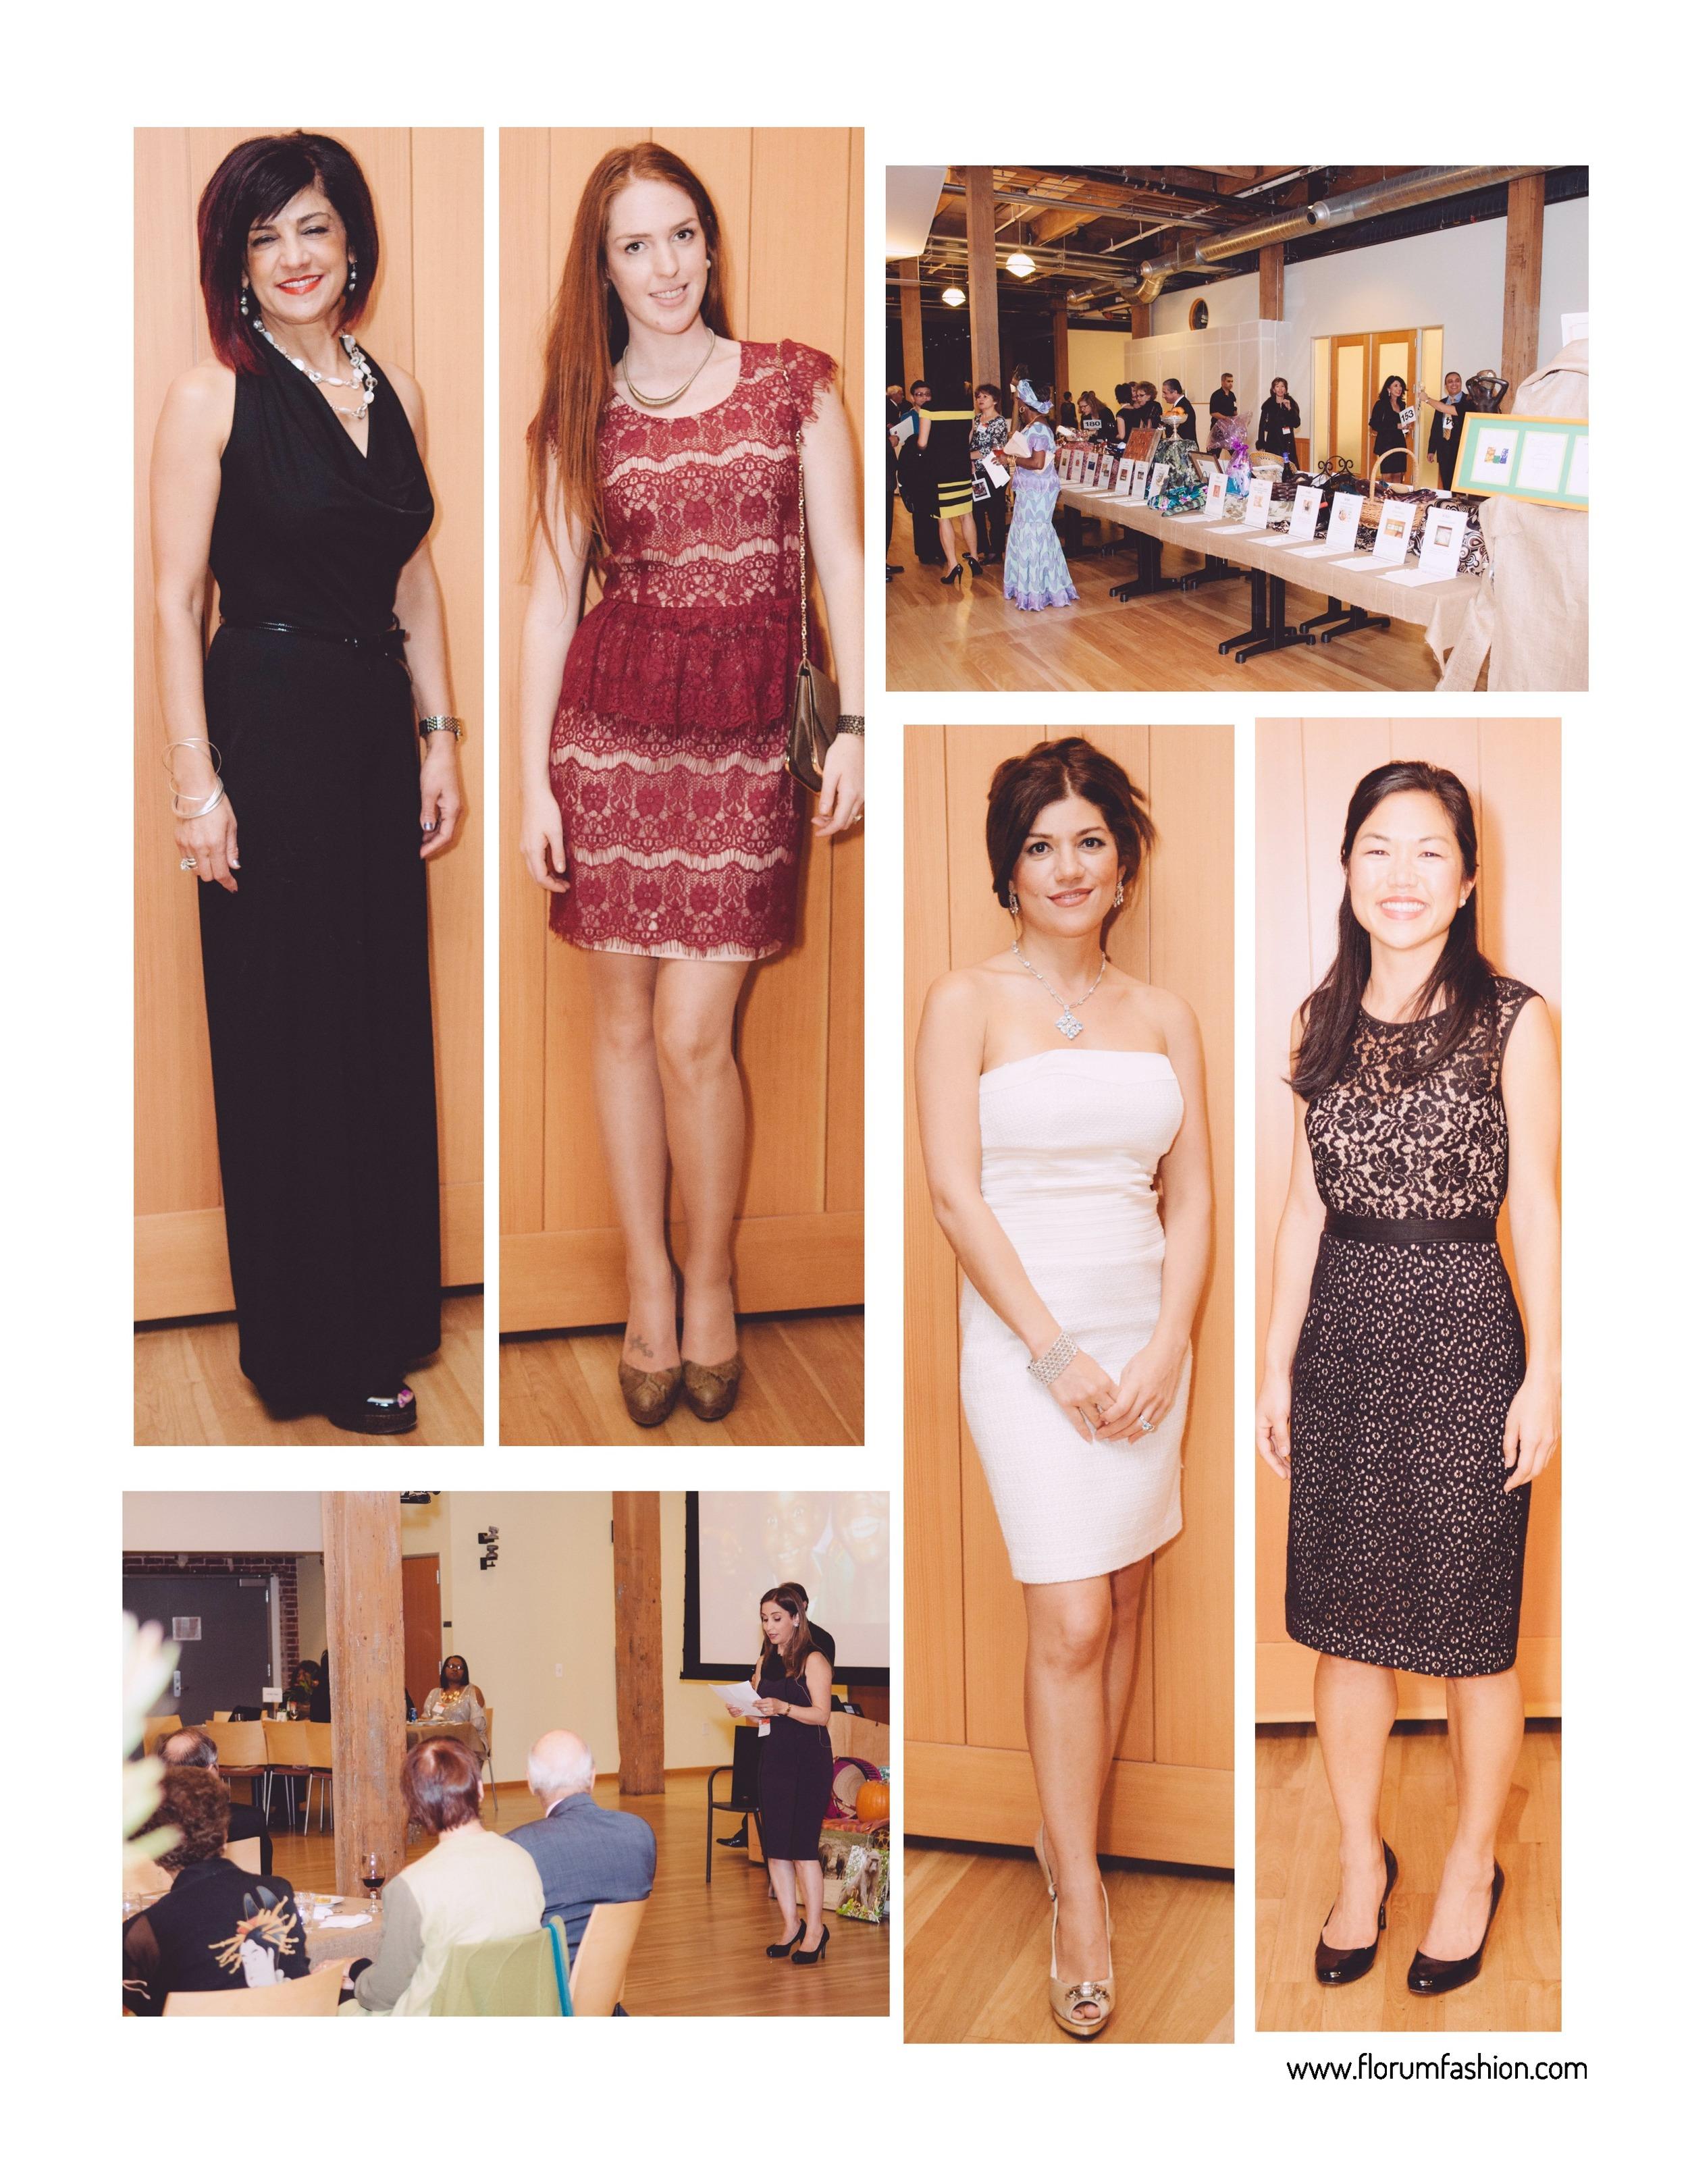 Amanda Mcgillvray Families Without Borders Florum Fashion Magazine Stephen Sun